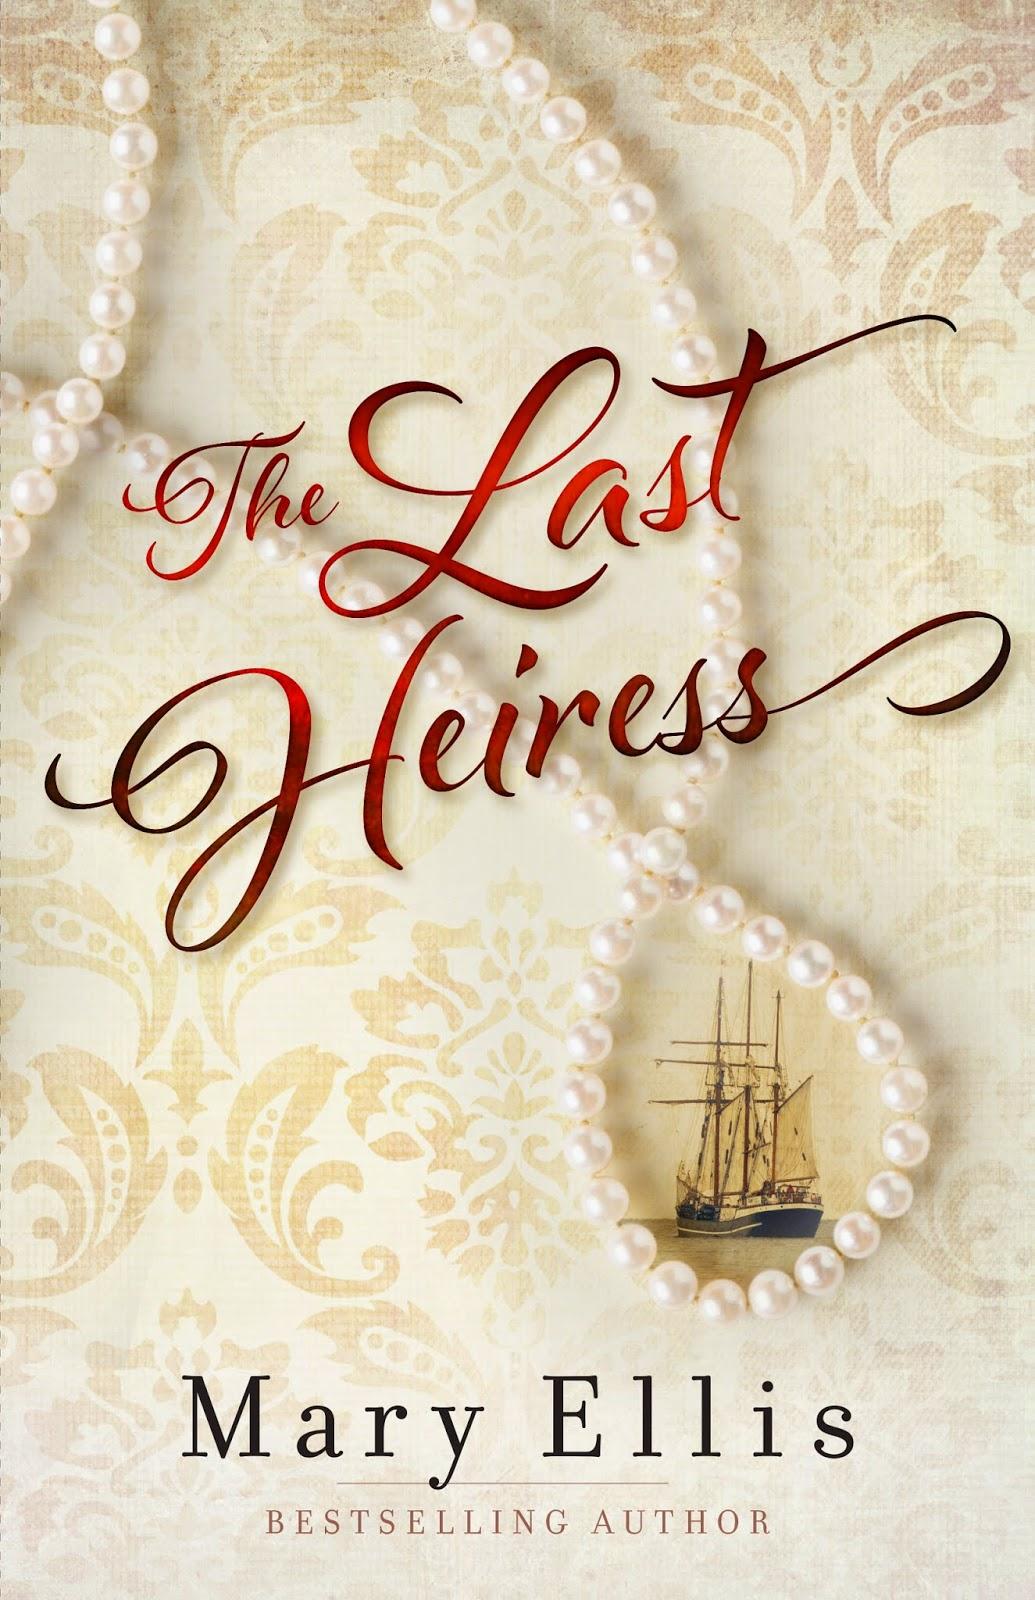 http://www.amazon.com/Last-Heiress-Mary-Ellis-ebook/dp/B00RYB9NHY/ref=sr_1_1?ie=UTF8&qid=1424968960&sr=8-1&keywords=the+last+heiress